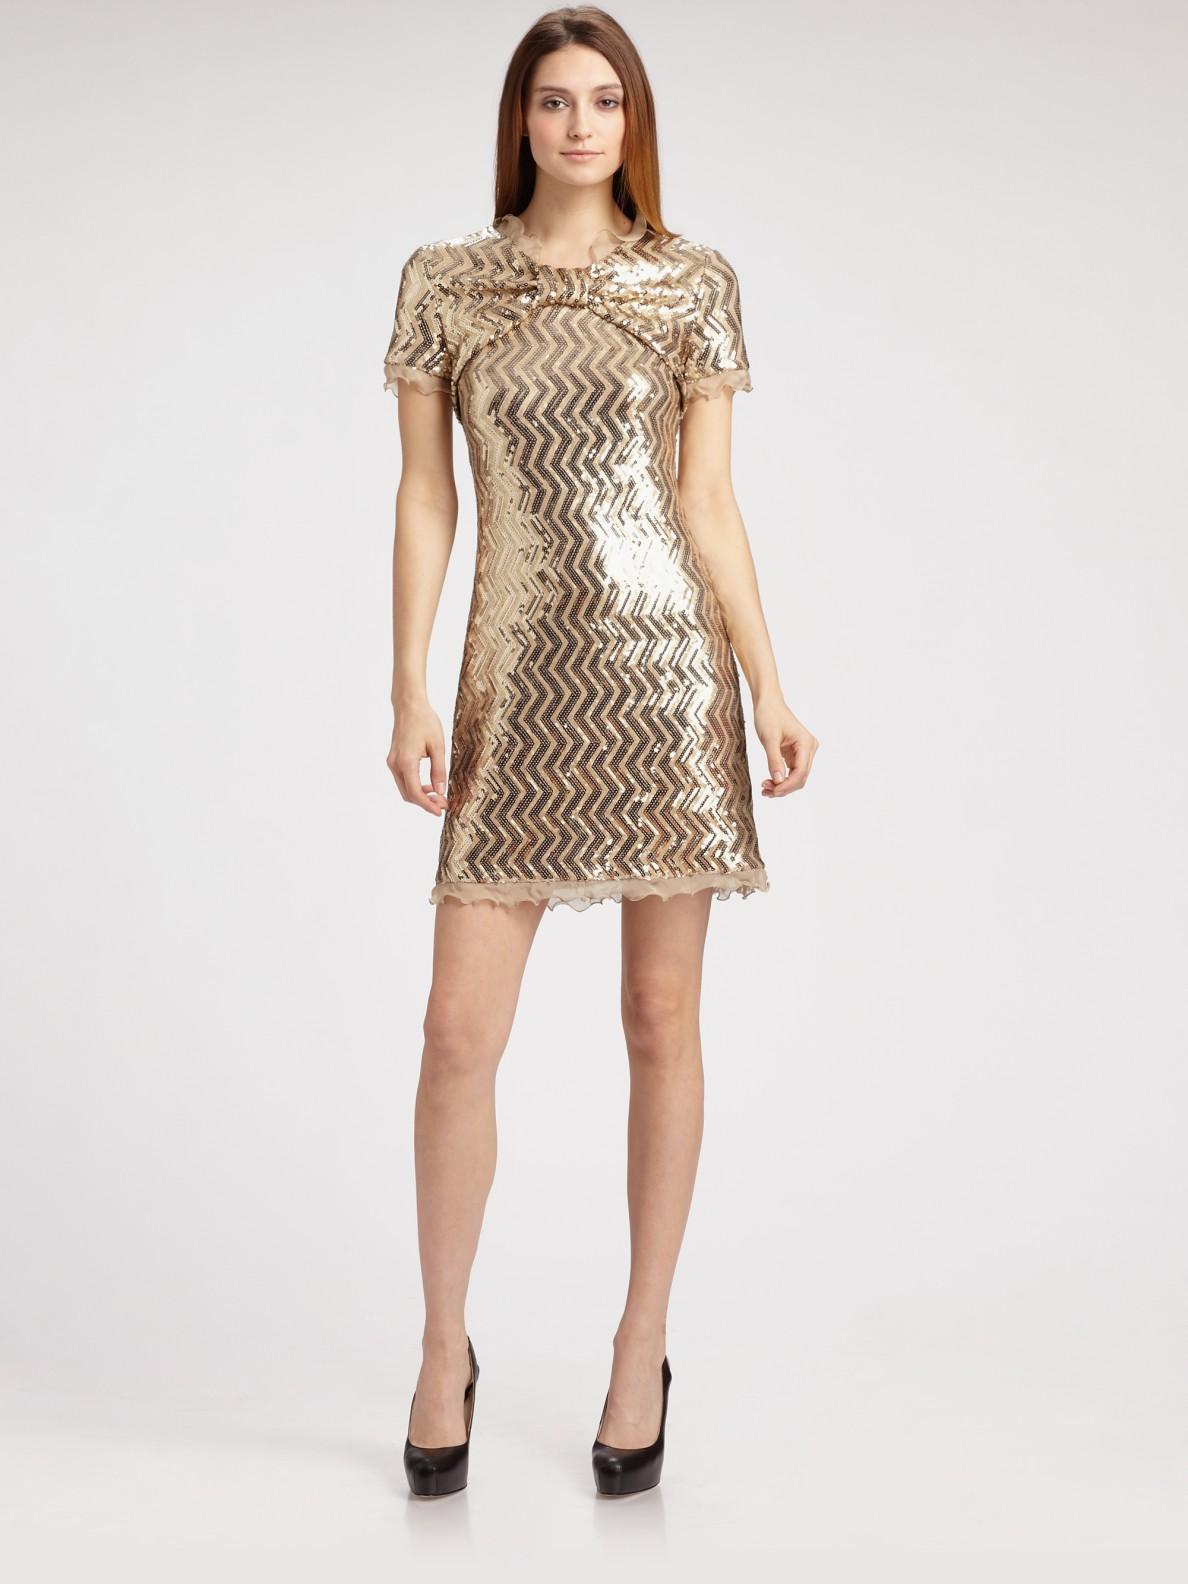 Cheap Gold Cocktail Dresses - Eligent Prom Dresses